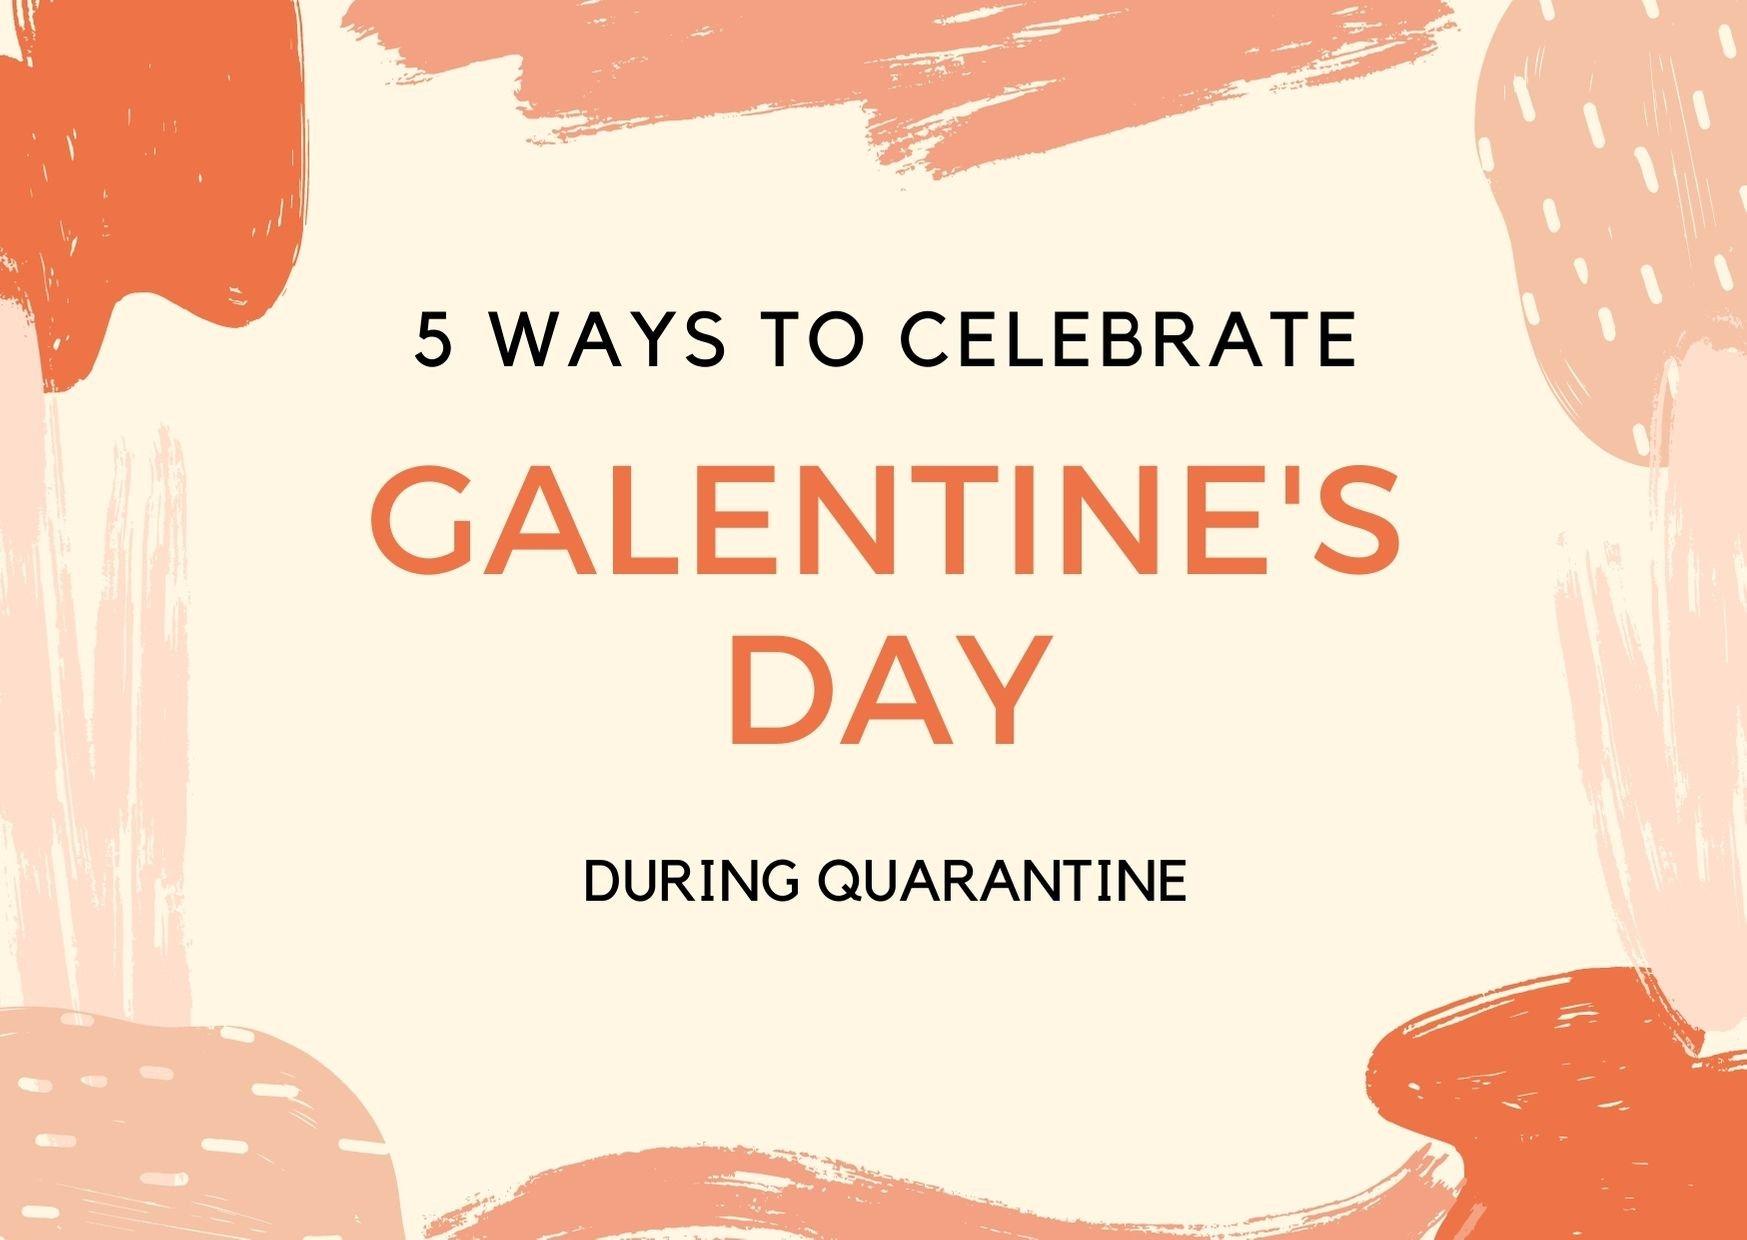 5 Ways To Celebrate Galentine's Day During Quarantine